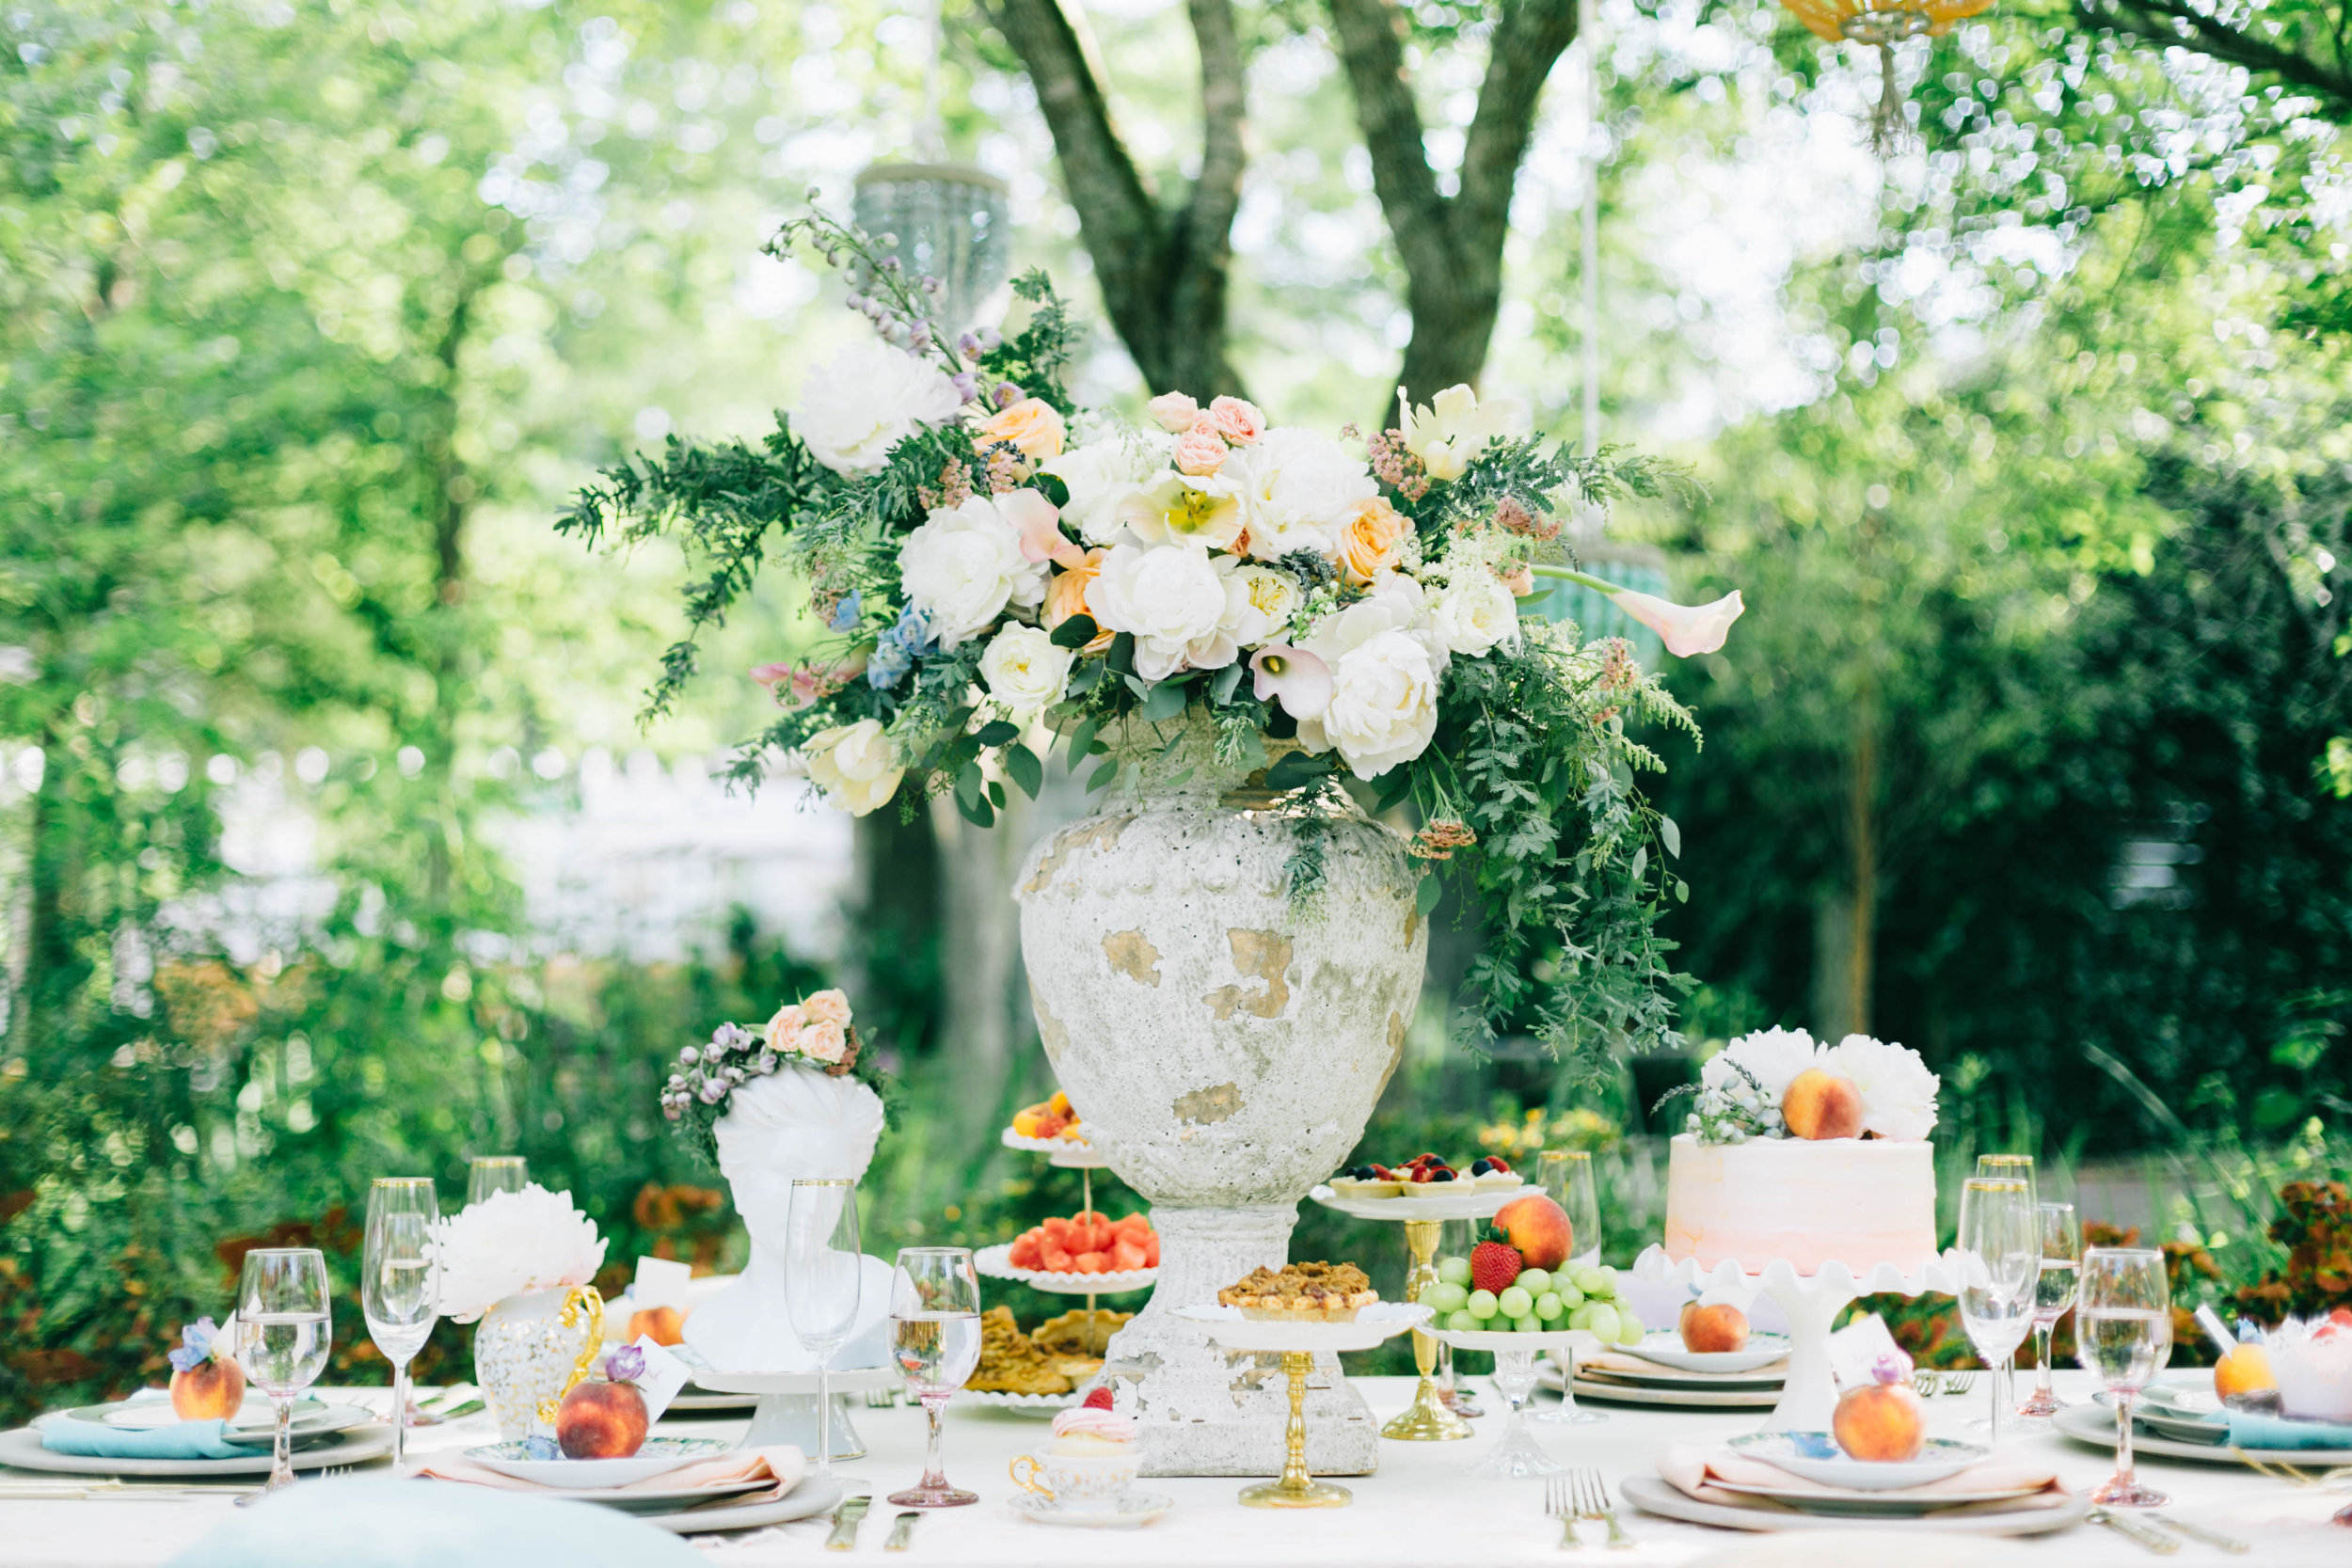 cypress gardens bridal shower shoot, charleston wedding planners